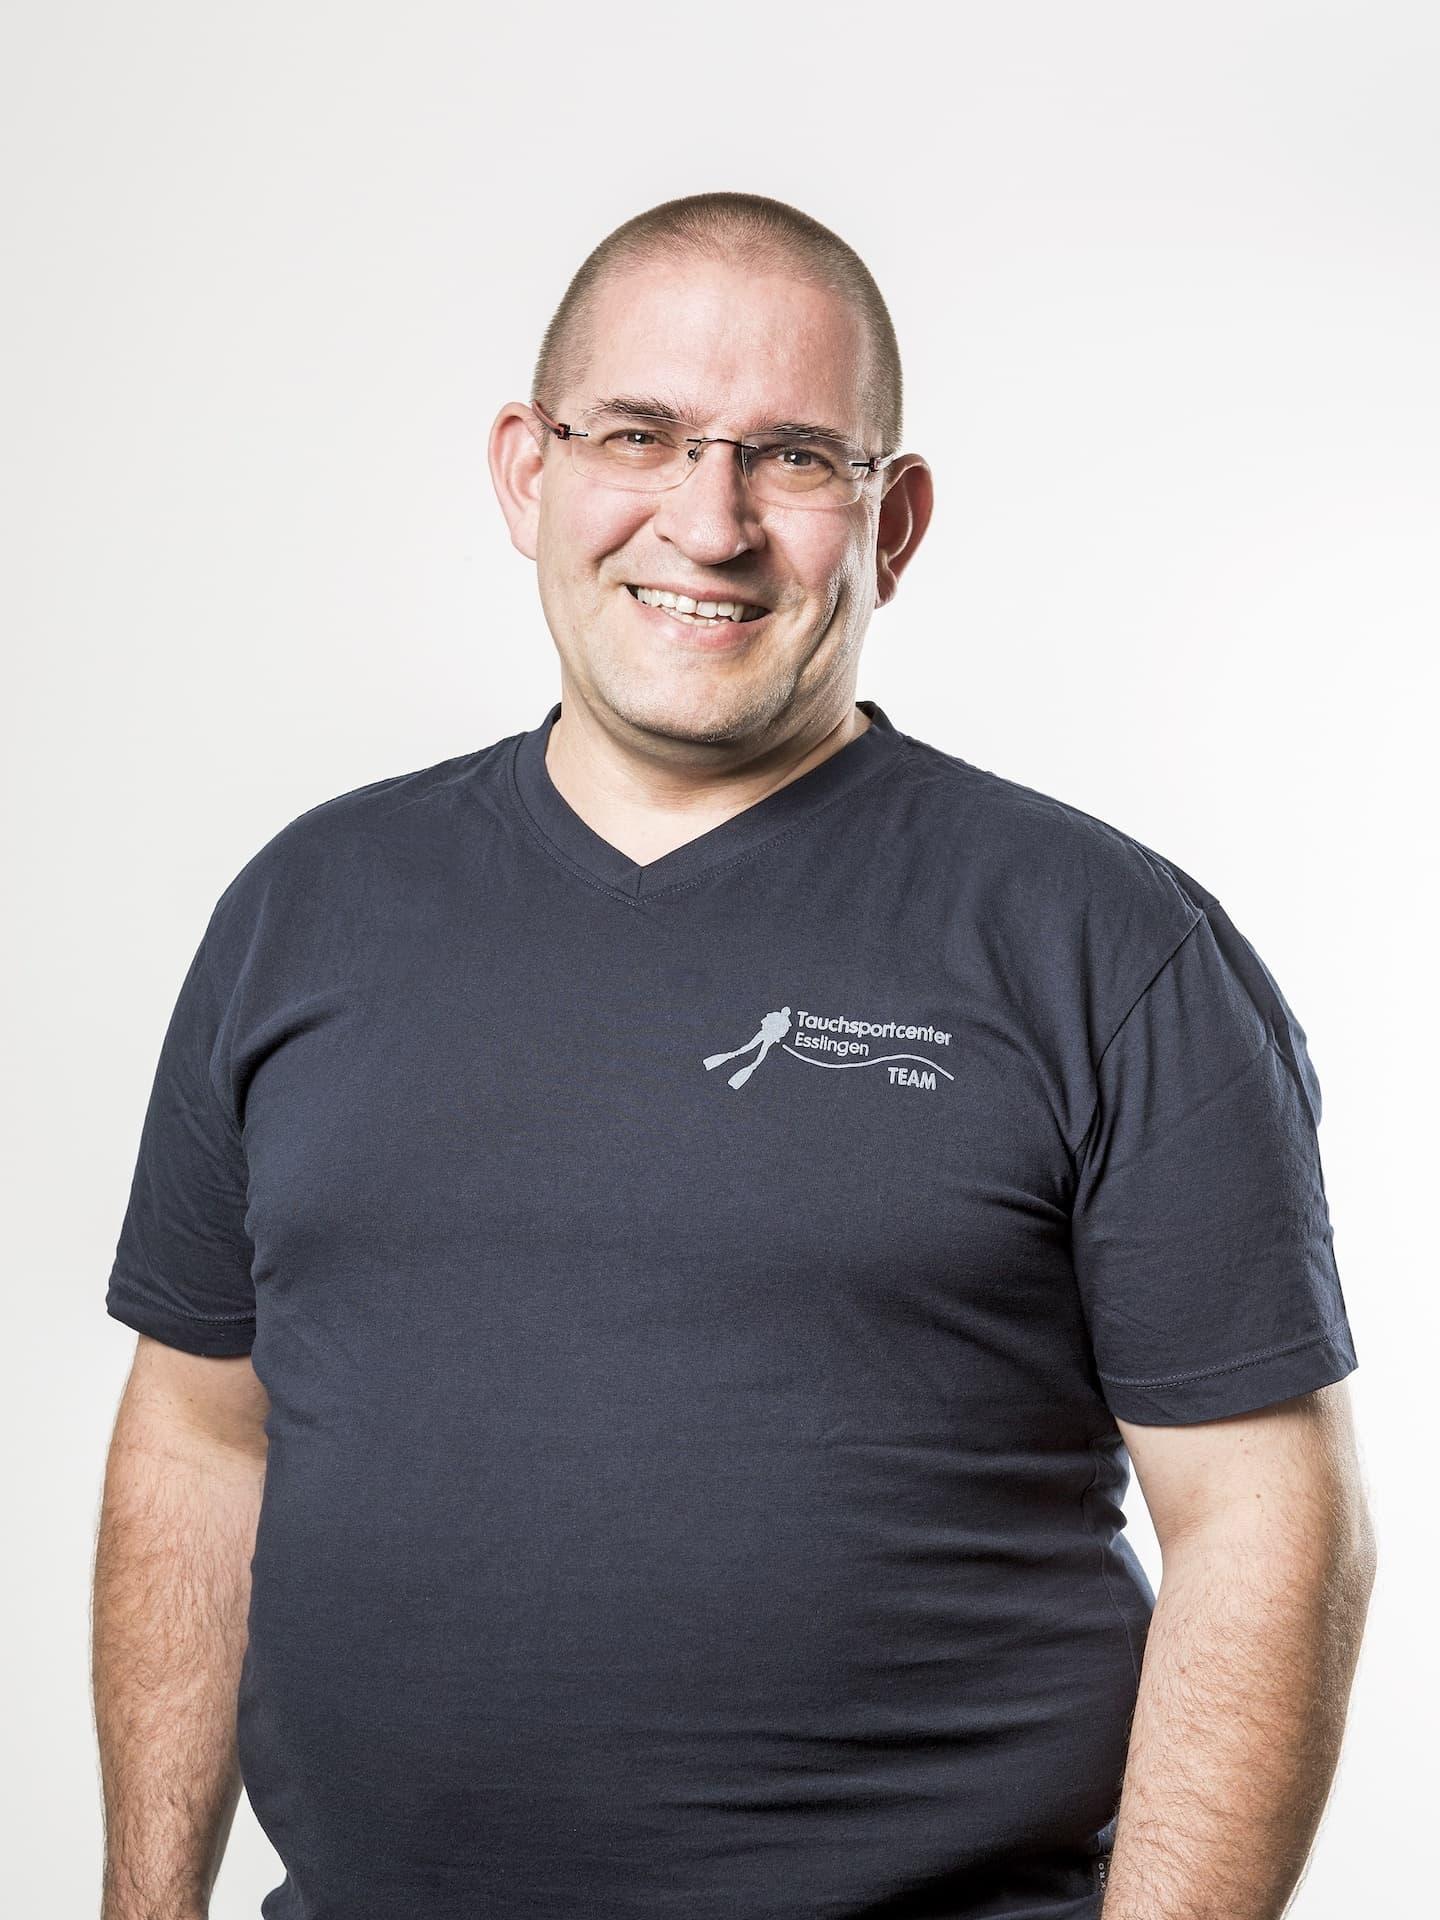 Jochen Rüdenauer